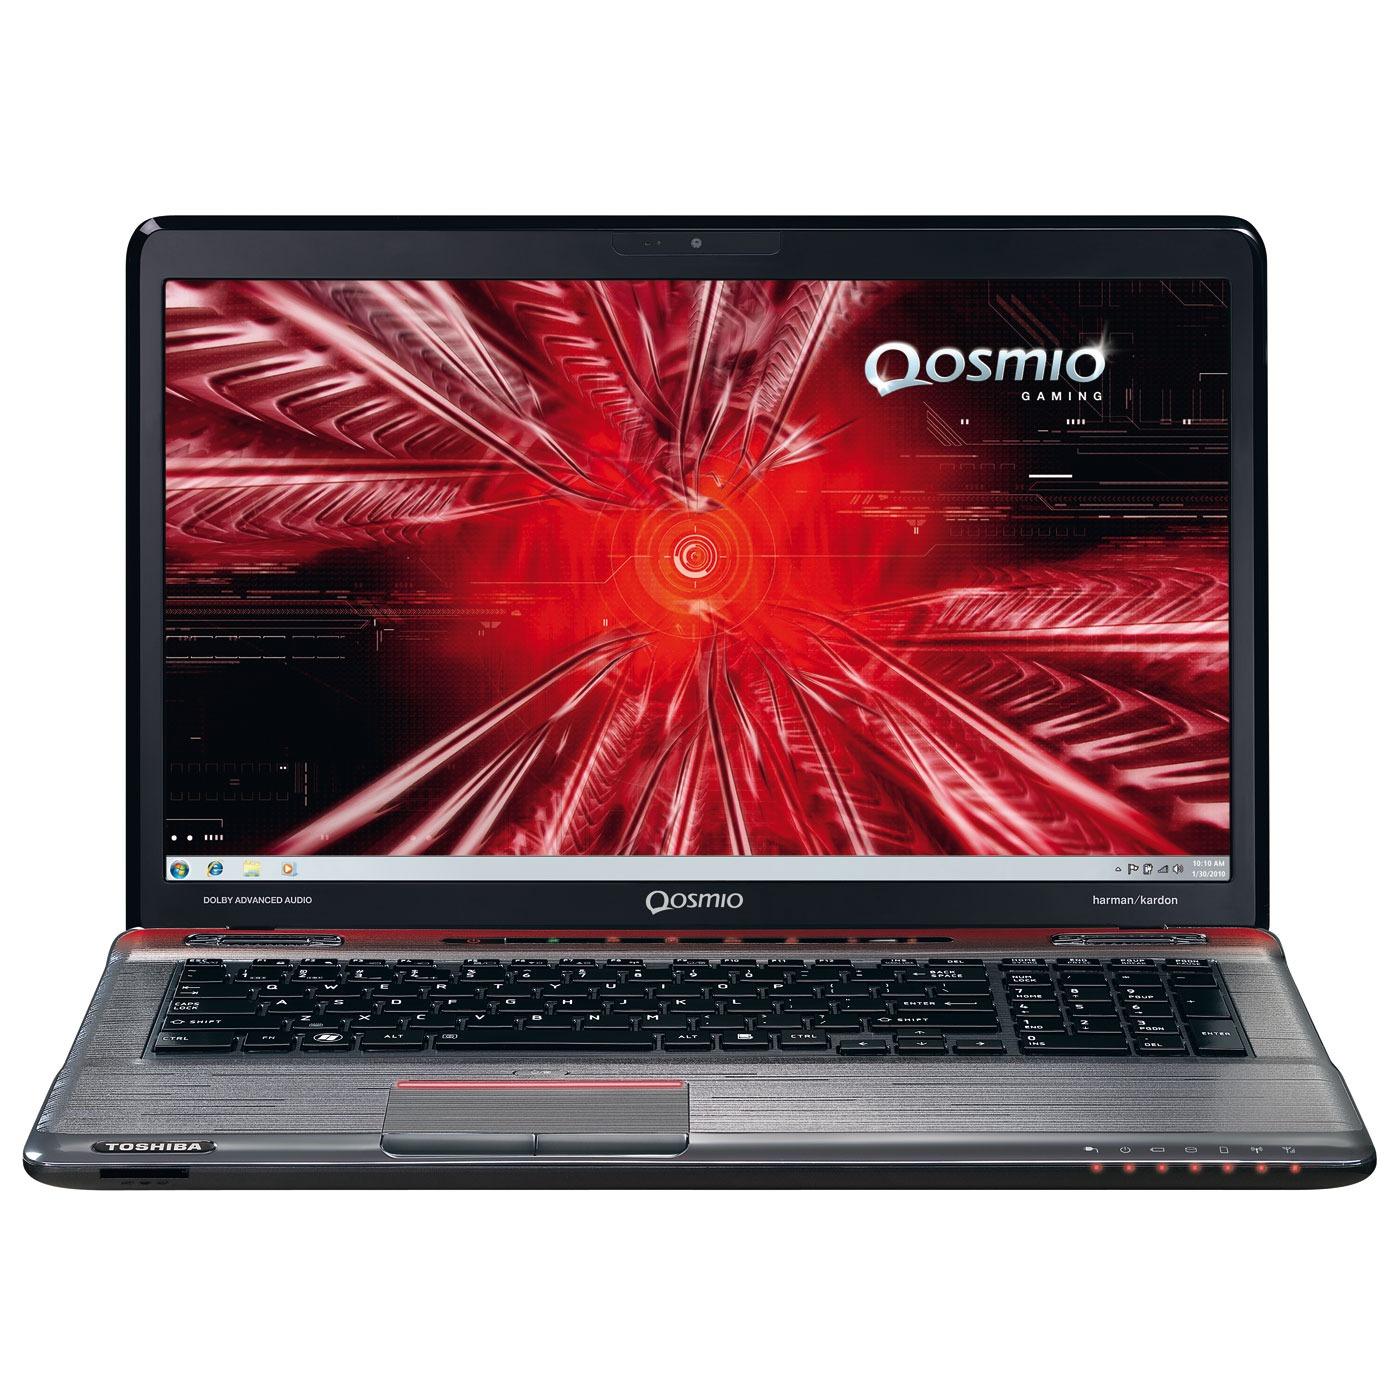 "PC portable Toshiba Qosmio X770-127 Intel Core i7-2670QM 4 Go 1 To (2x 500 Go) 17.3"" LED NVIDIA GeForce GTX 560M Lecteur Blu-ray/Graveur DVD Wi-Fi N/Bluetooth Webcam Windows 7 Premium 64 bits"